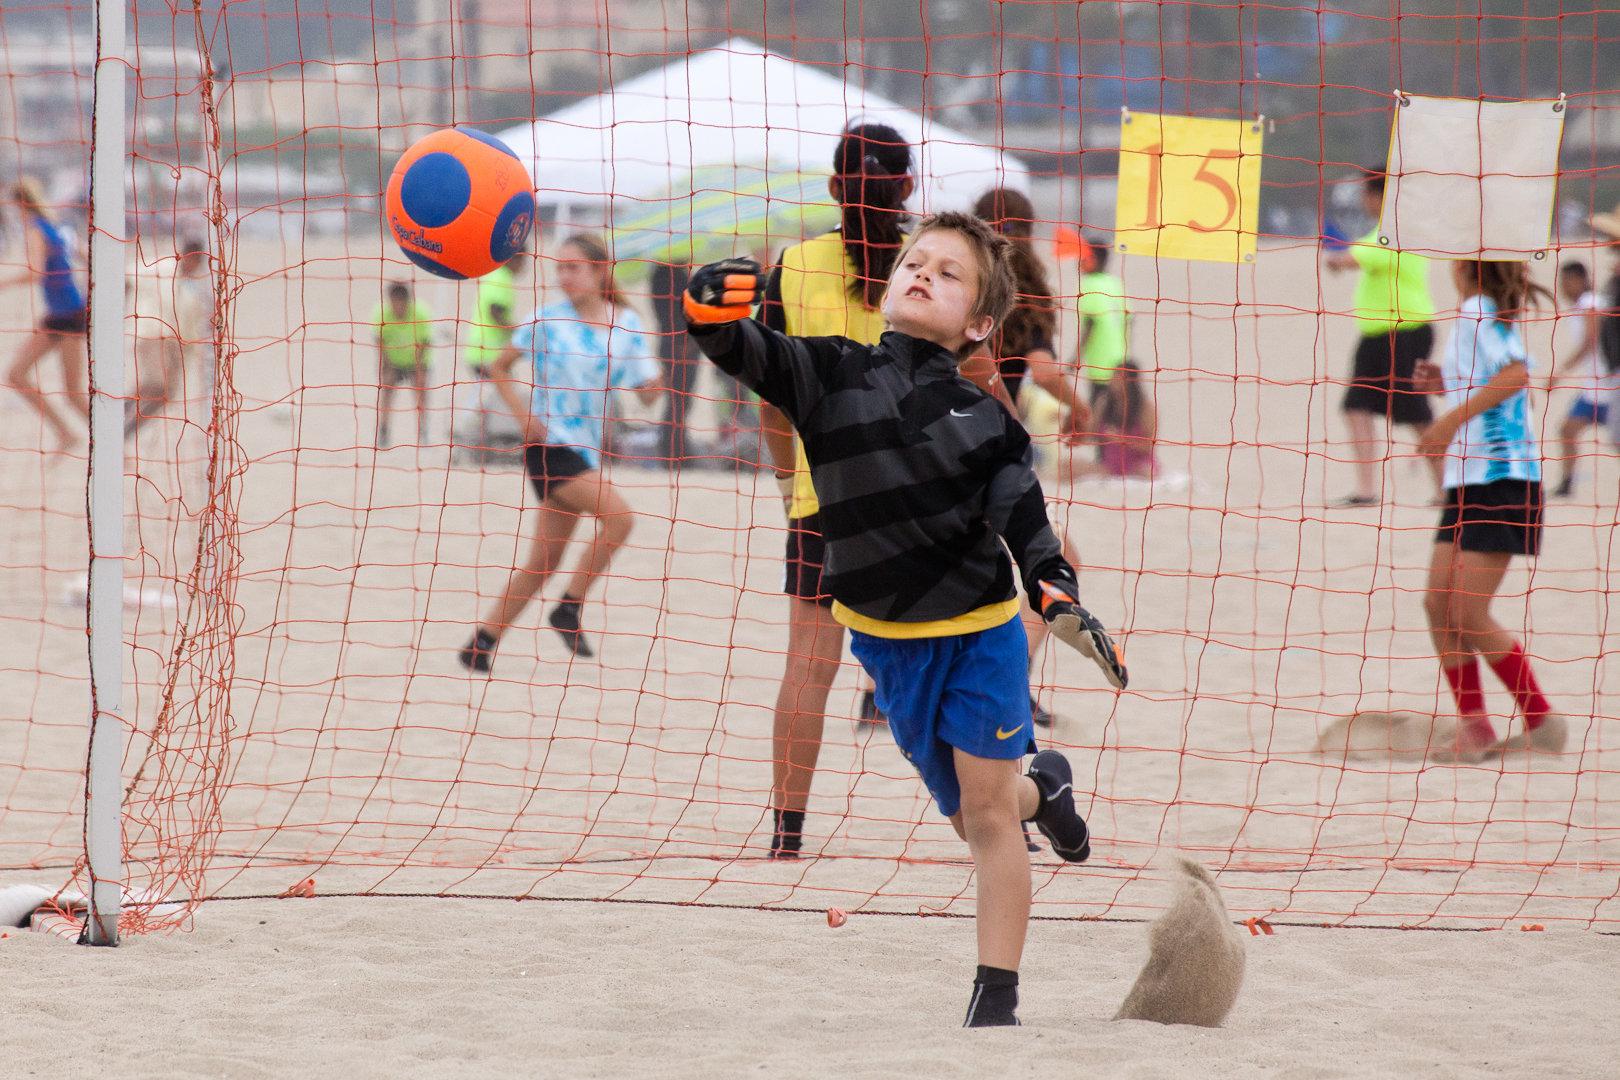 Brazil Stars finish as Champions<br>2012 Copa Cabana Santa Monica Tournament